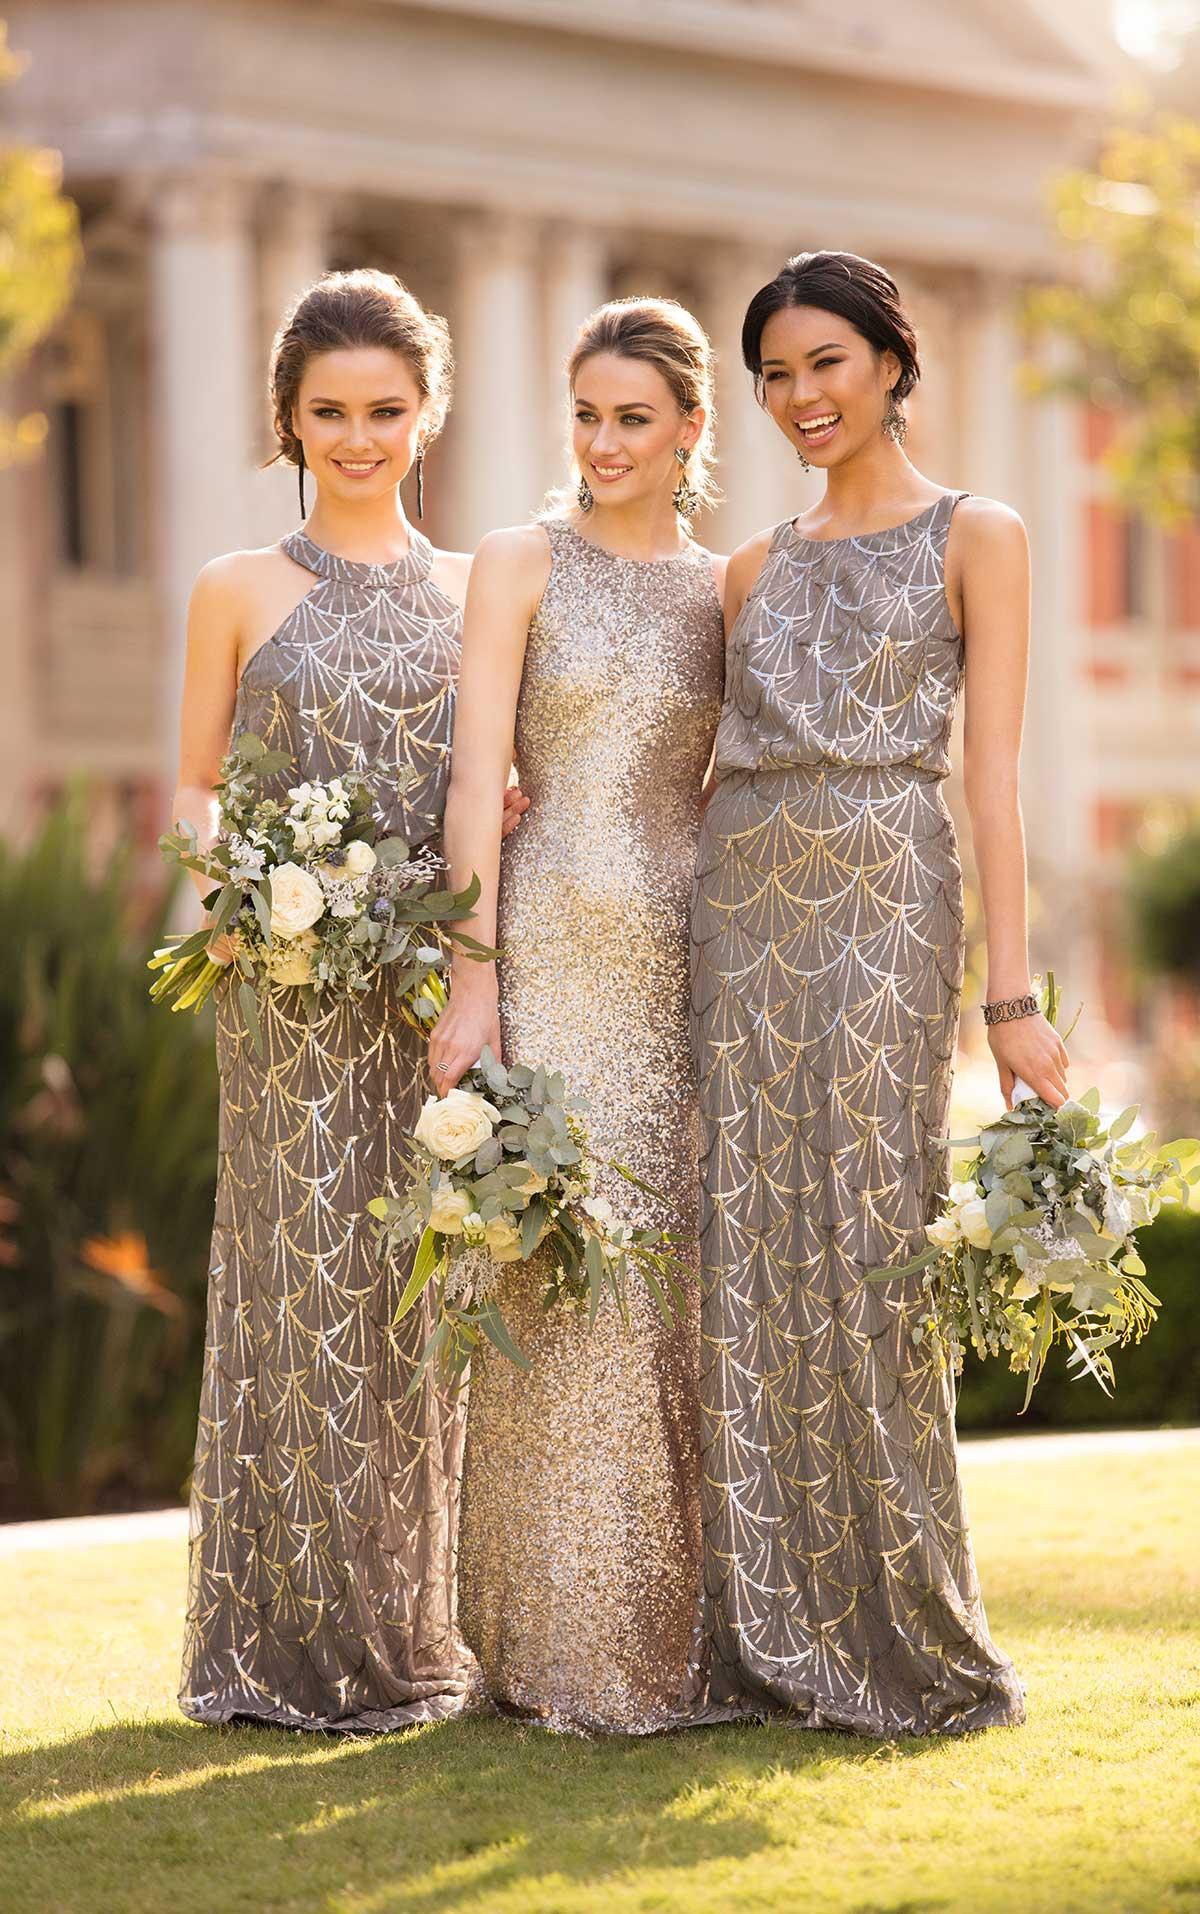 10 Beautiful Bridesmaid Dress Trends for 2018 Weddings ...